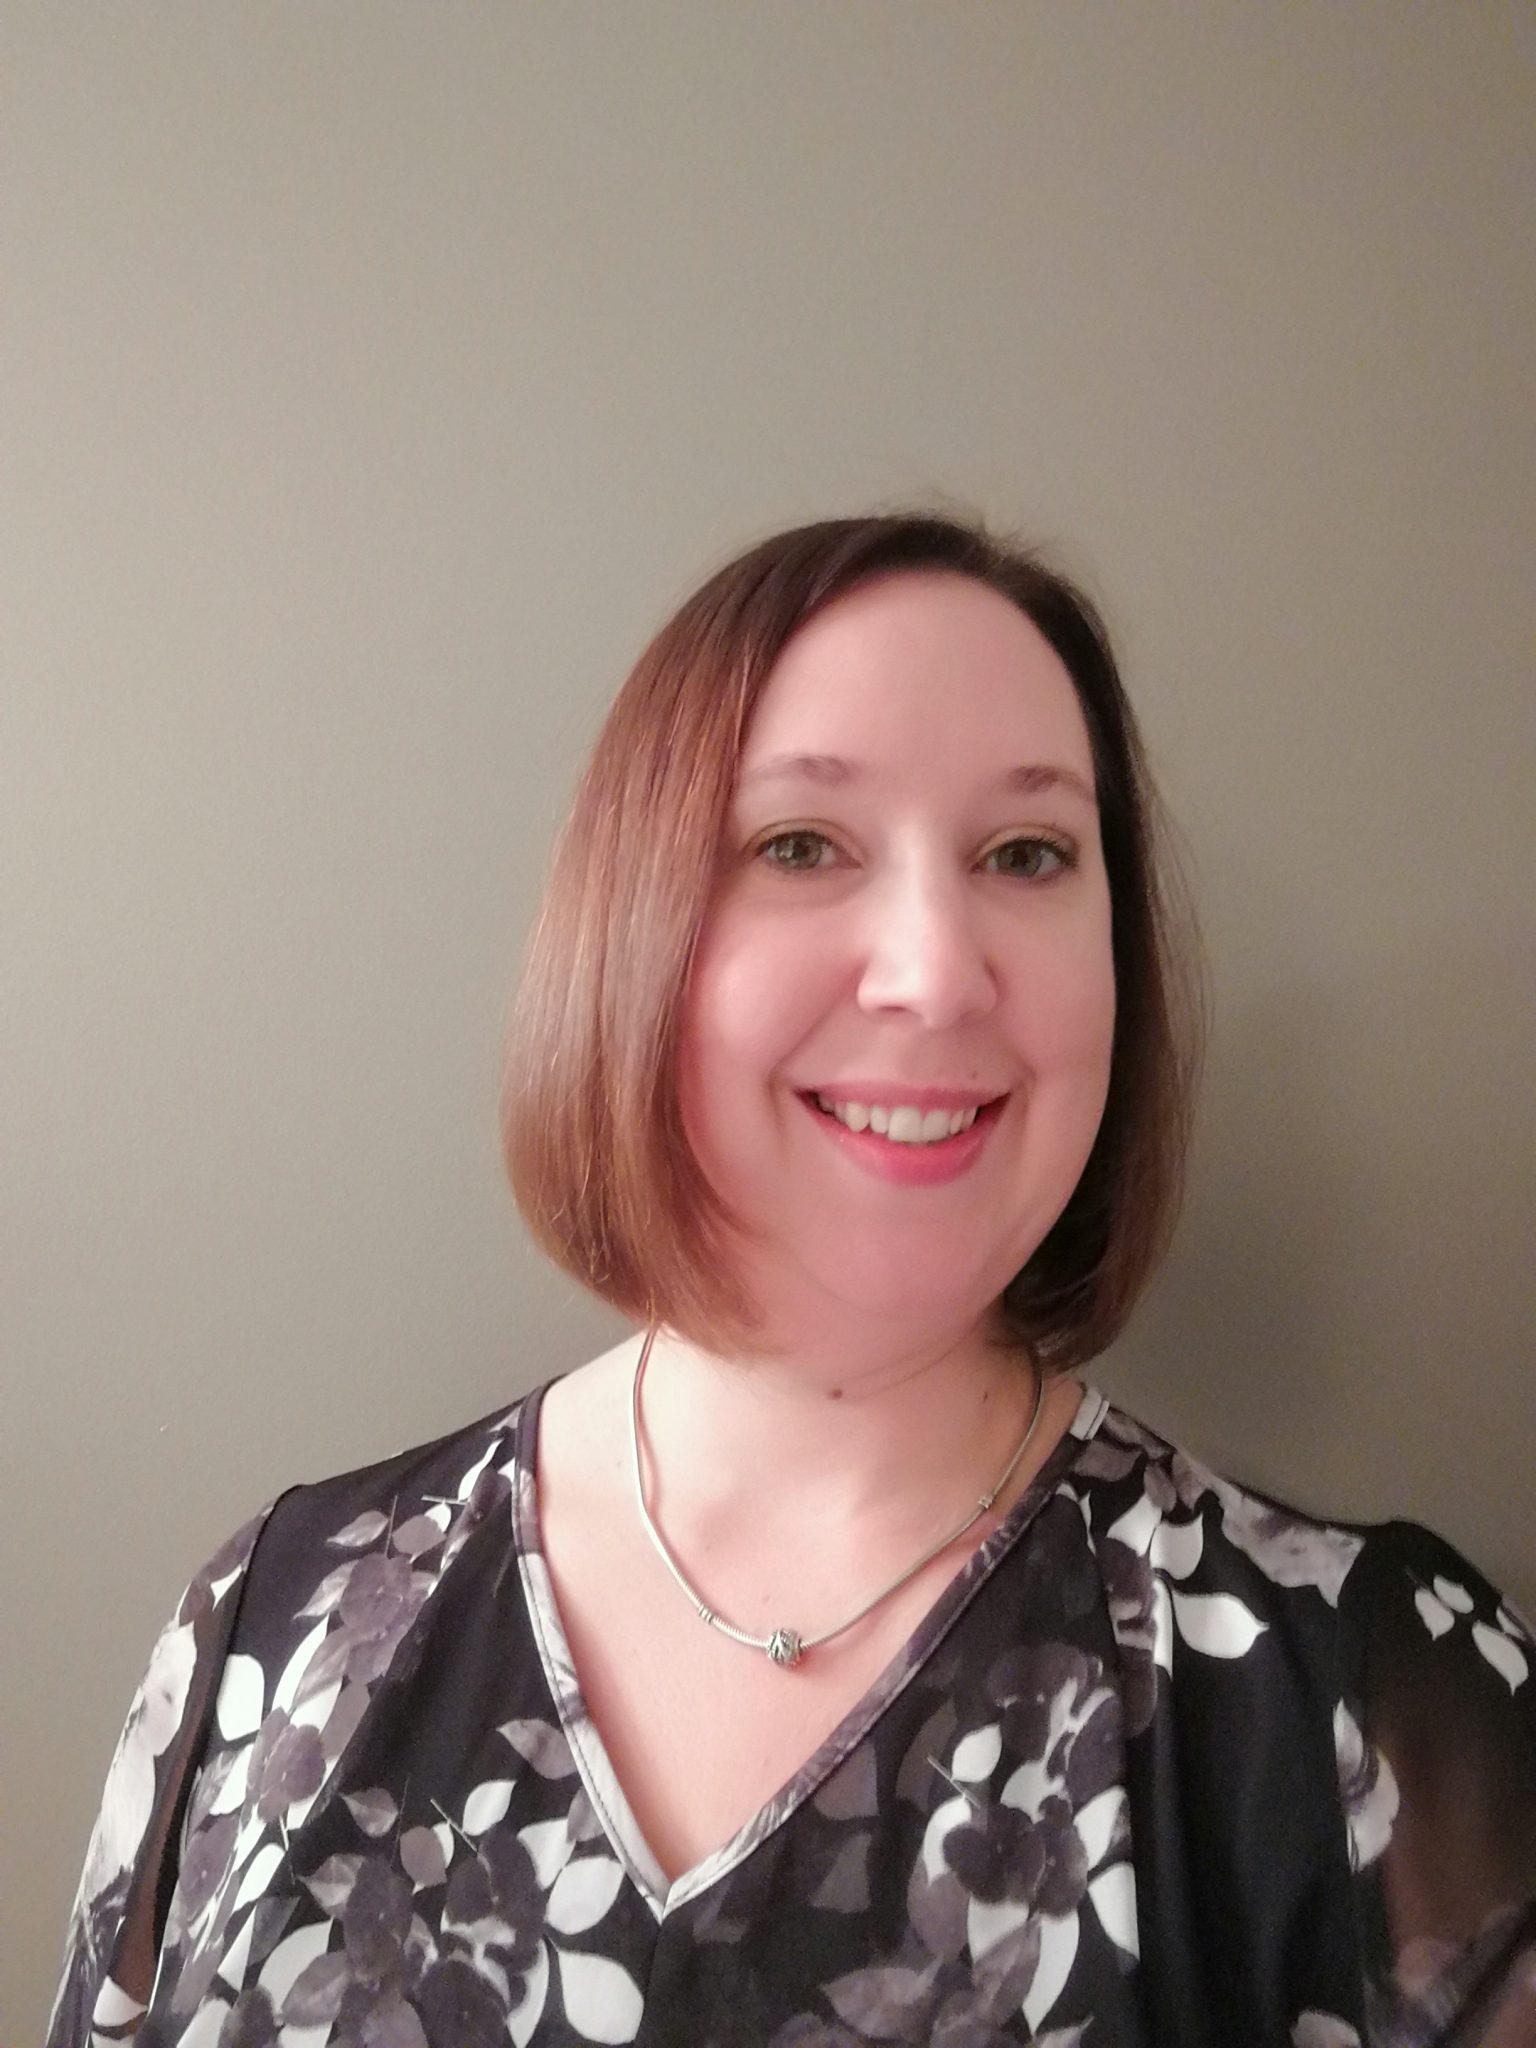 Amber Laing Occupational Therapist OT Calgary